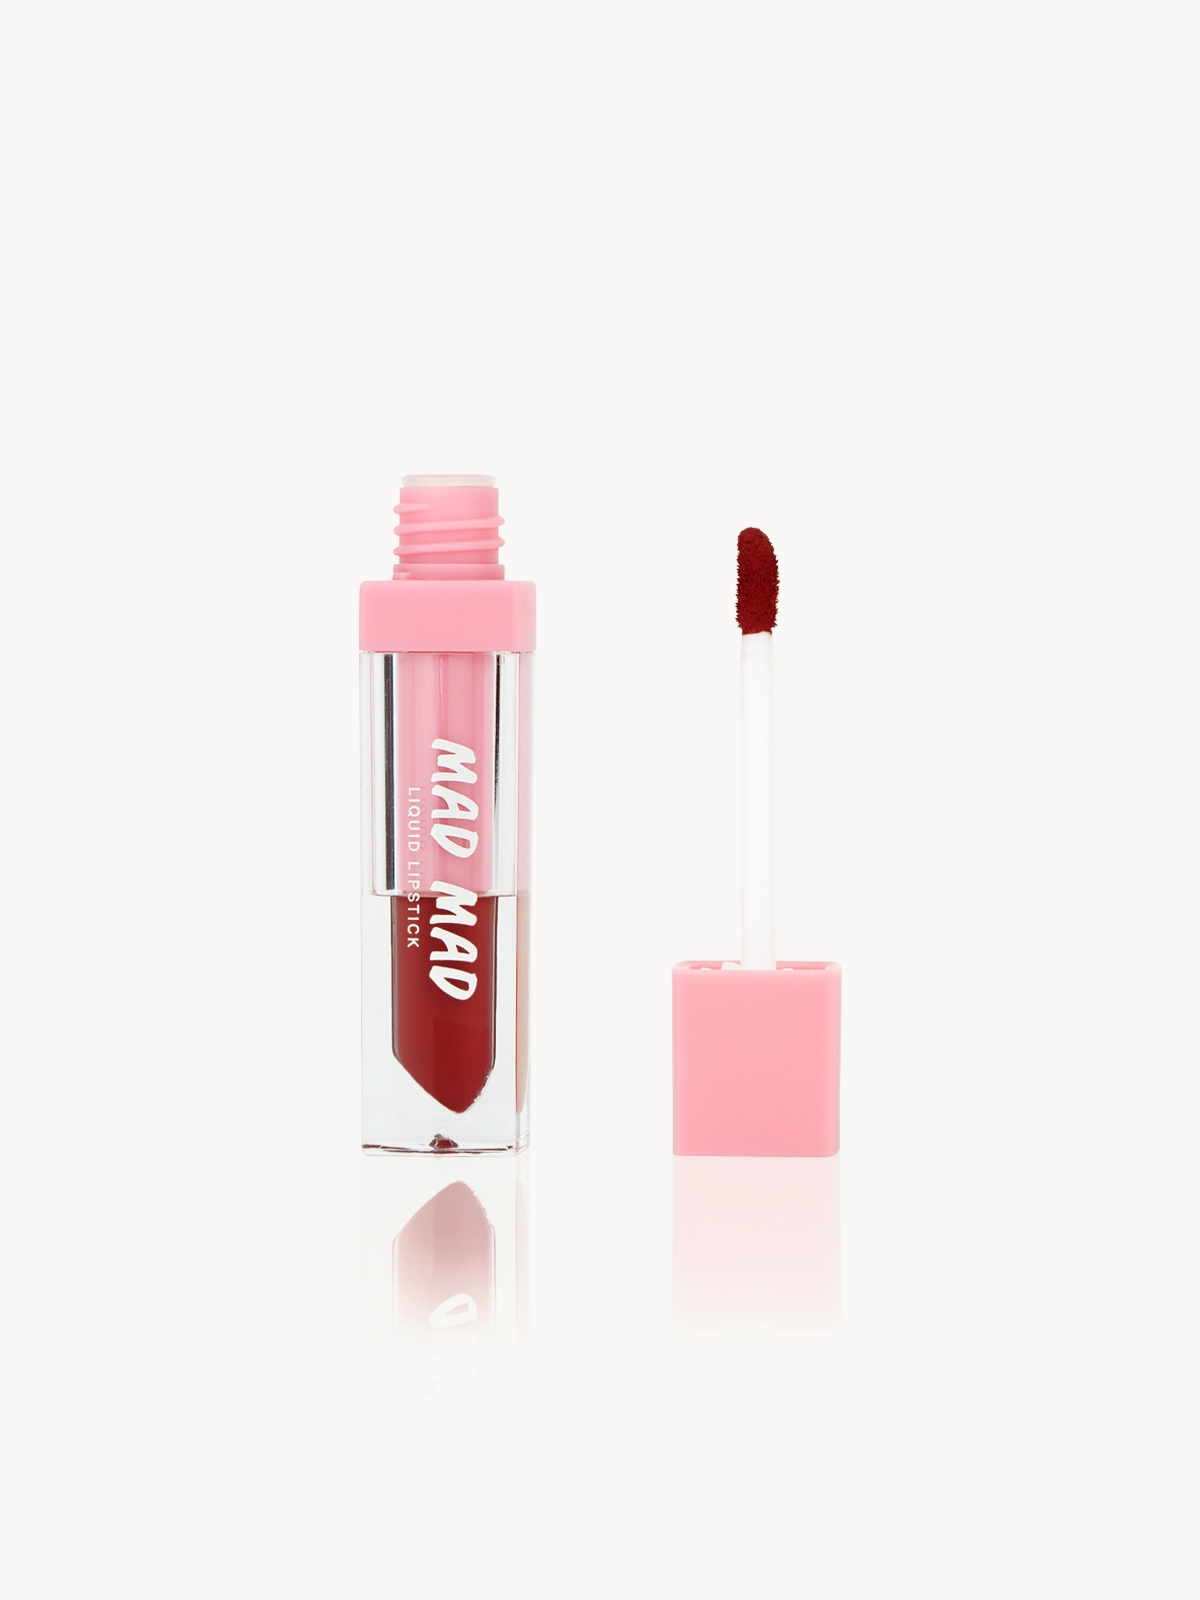 MAD MAD Matte Liquid Lipstick No 014 Angry Mermaid